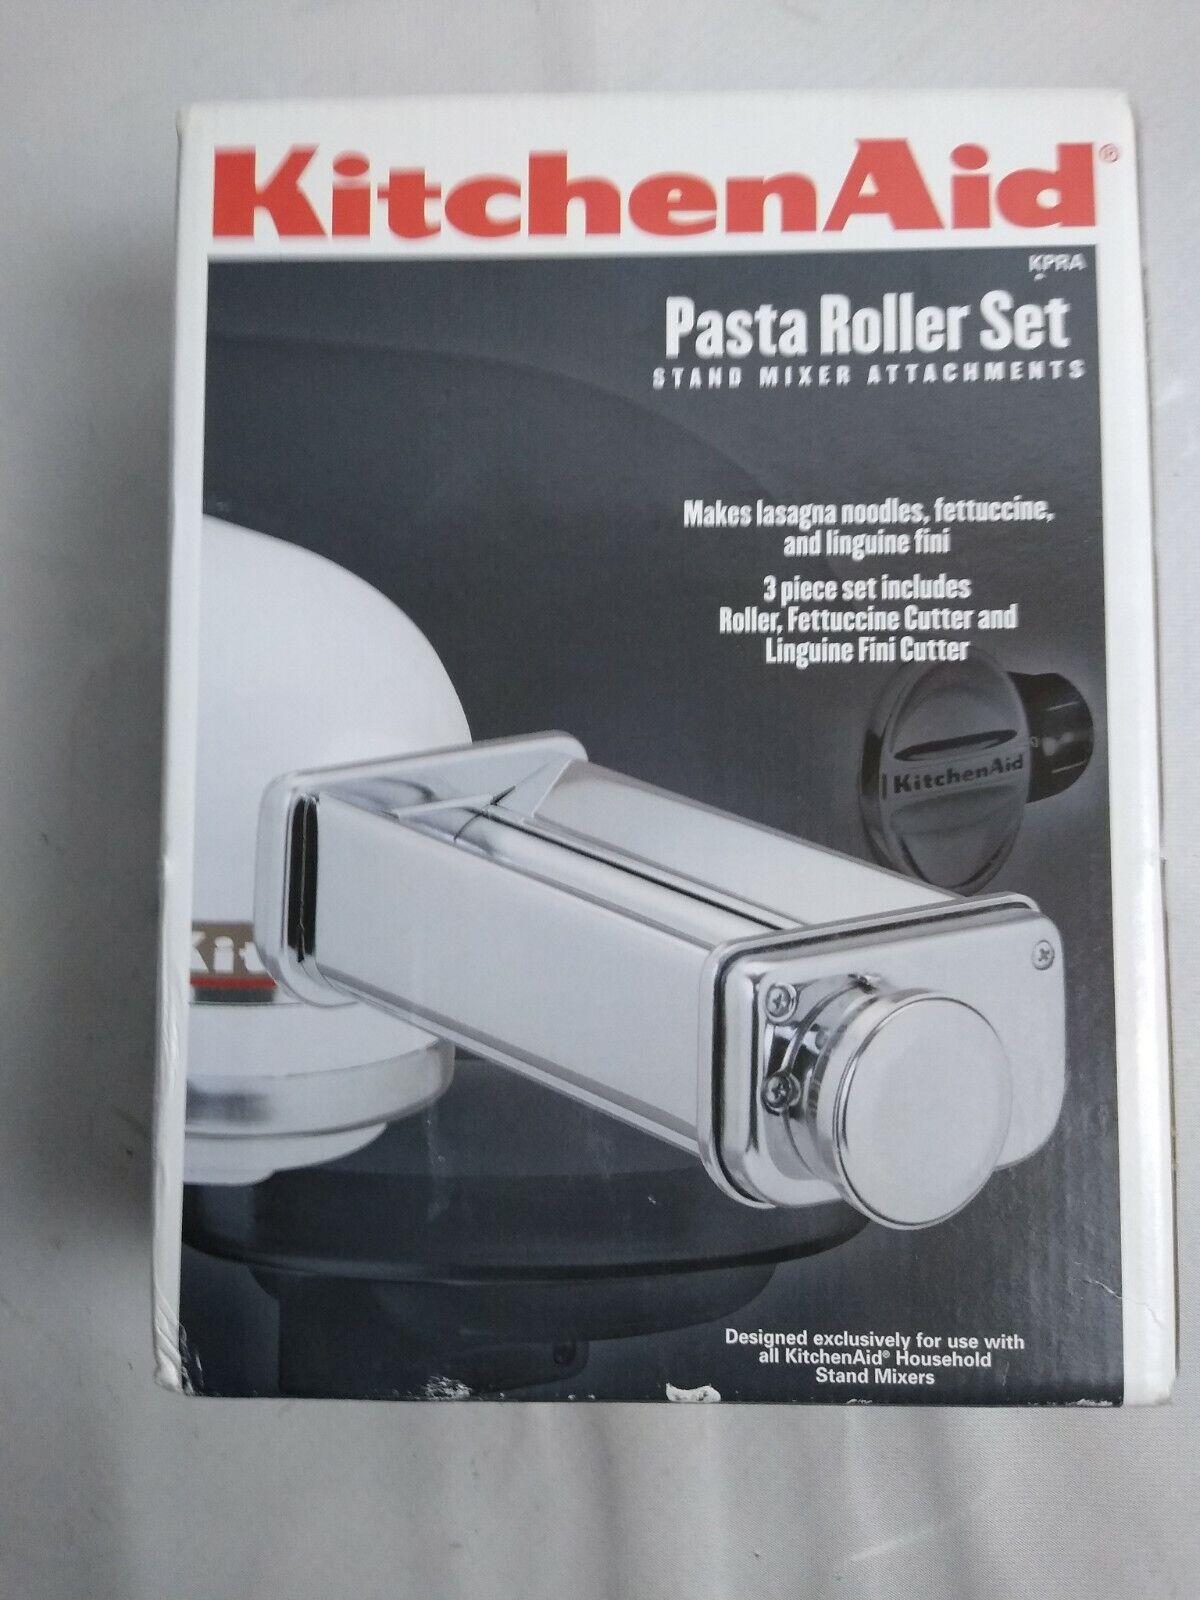 KitchenAid KPRA 3-Piece Pasta Roller and Cutter Set 2 pieces